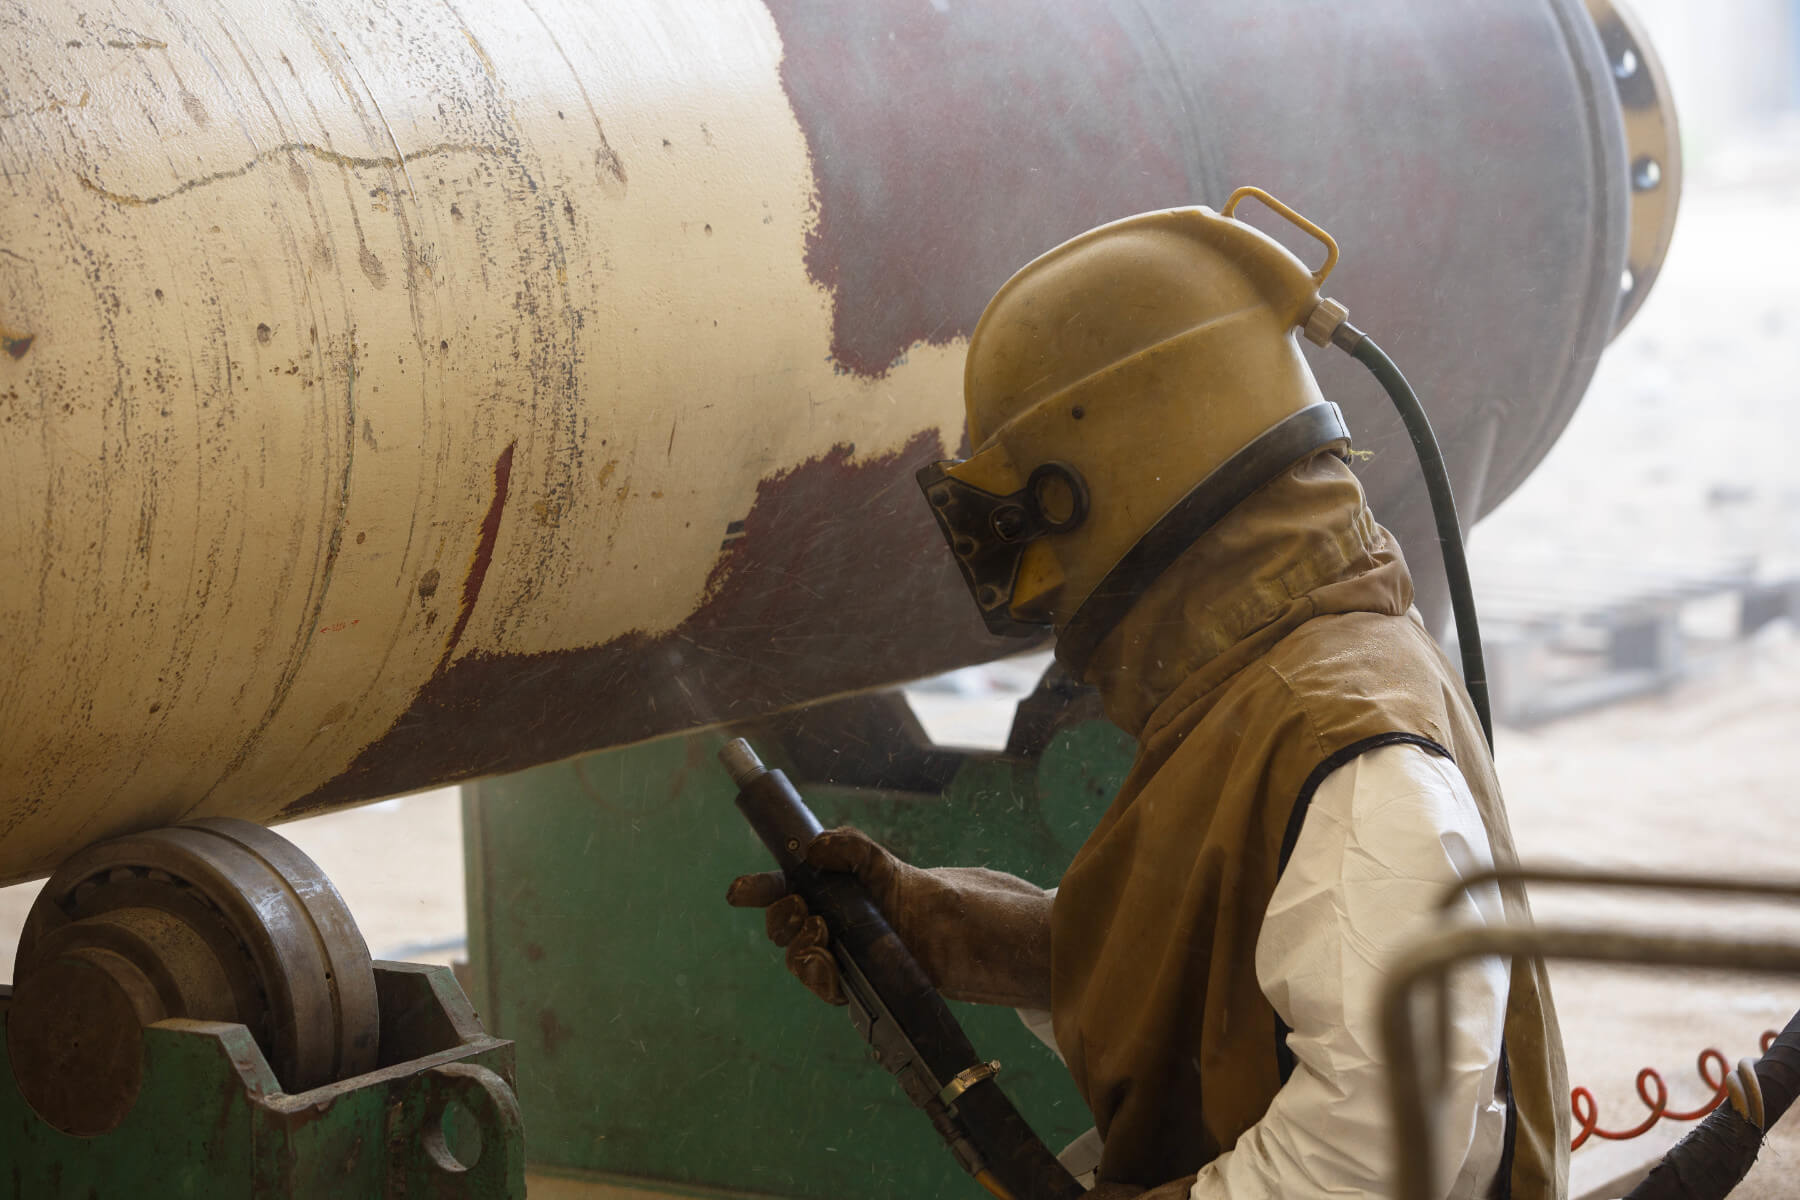 Atlantic Powder Coating Services In Jacksonville FL